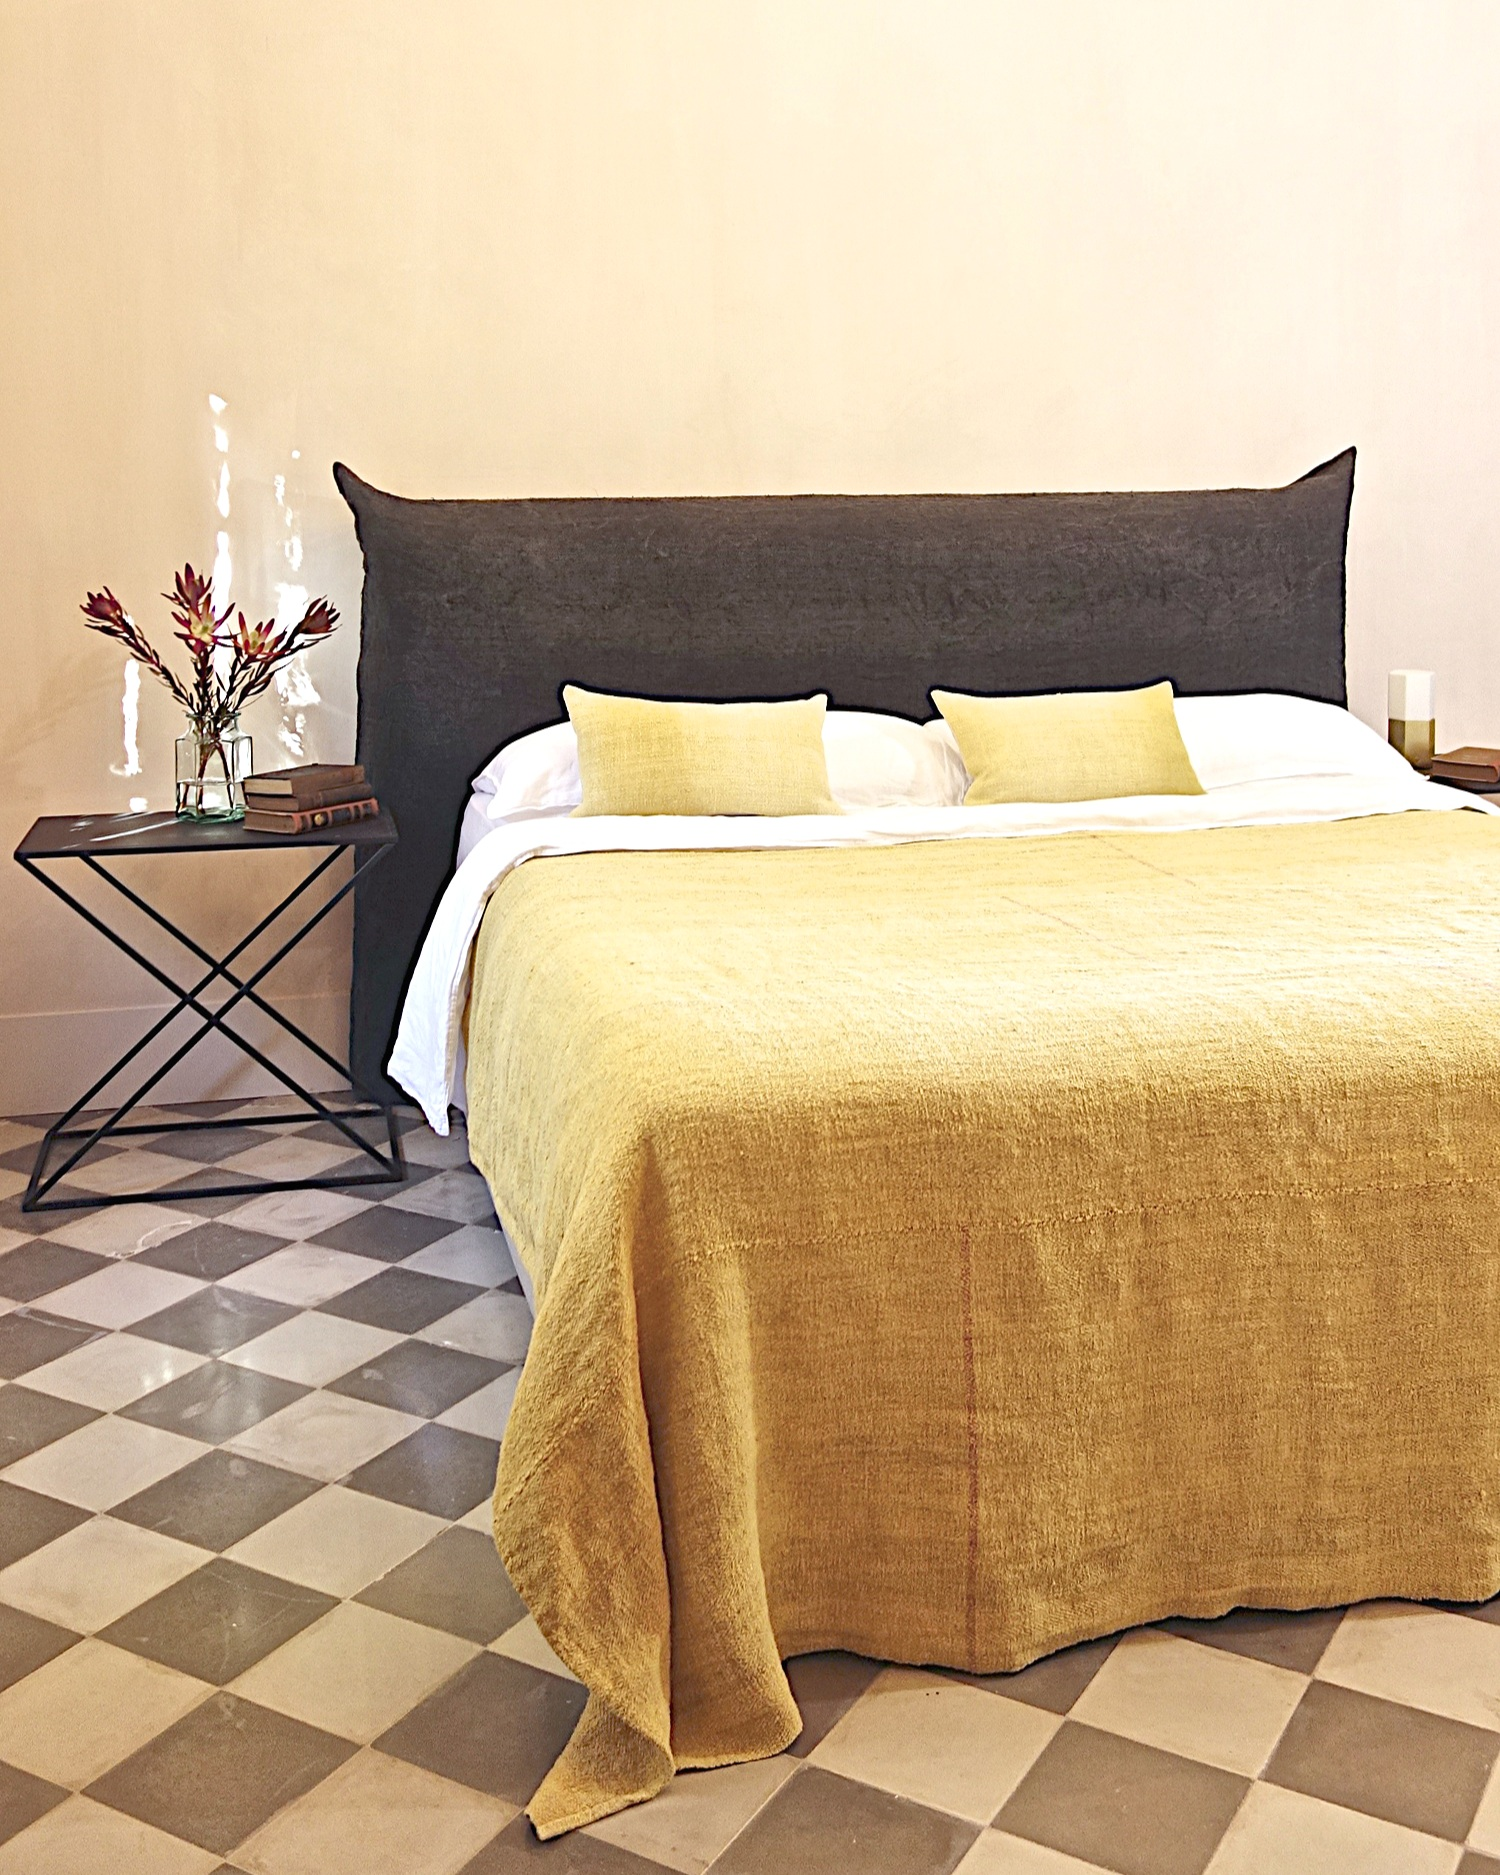 espanyolet_bedding_bedcover_quilt_vintage_linen.jpg